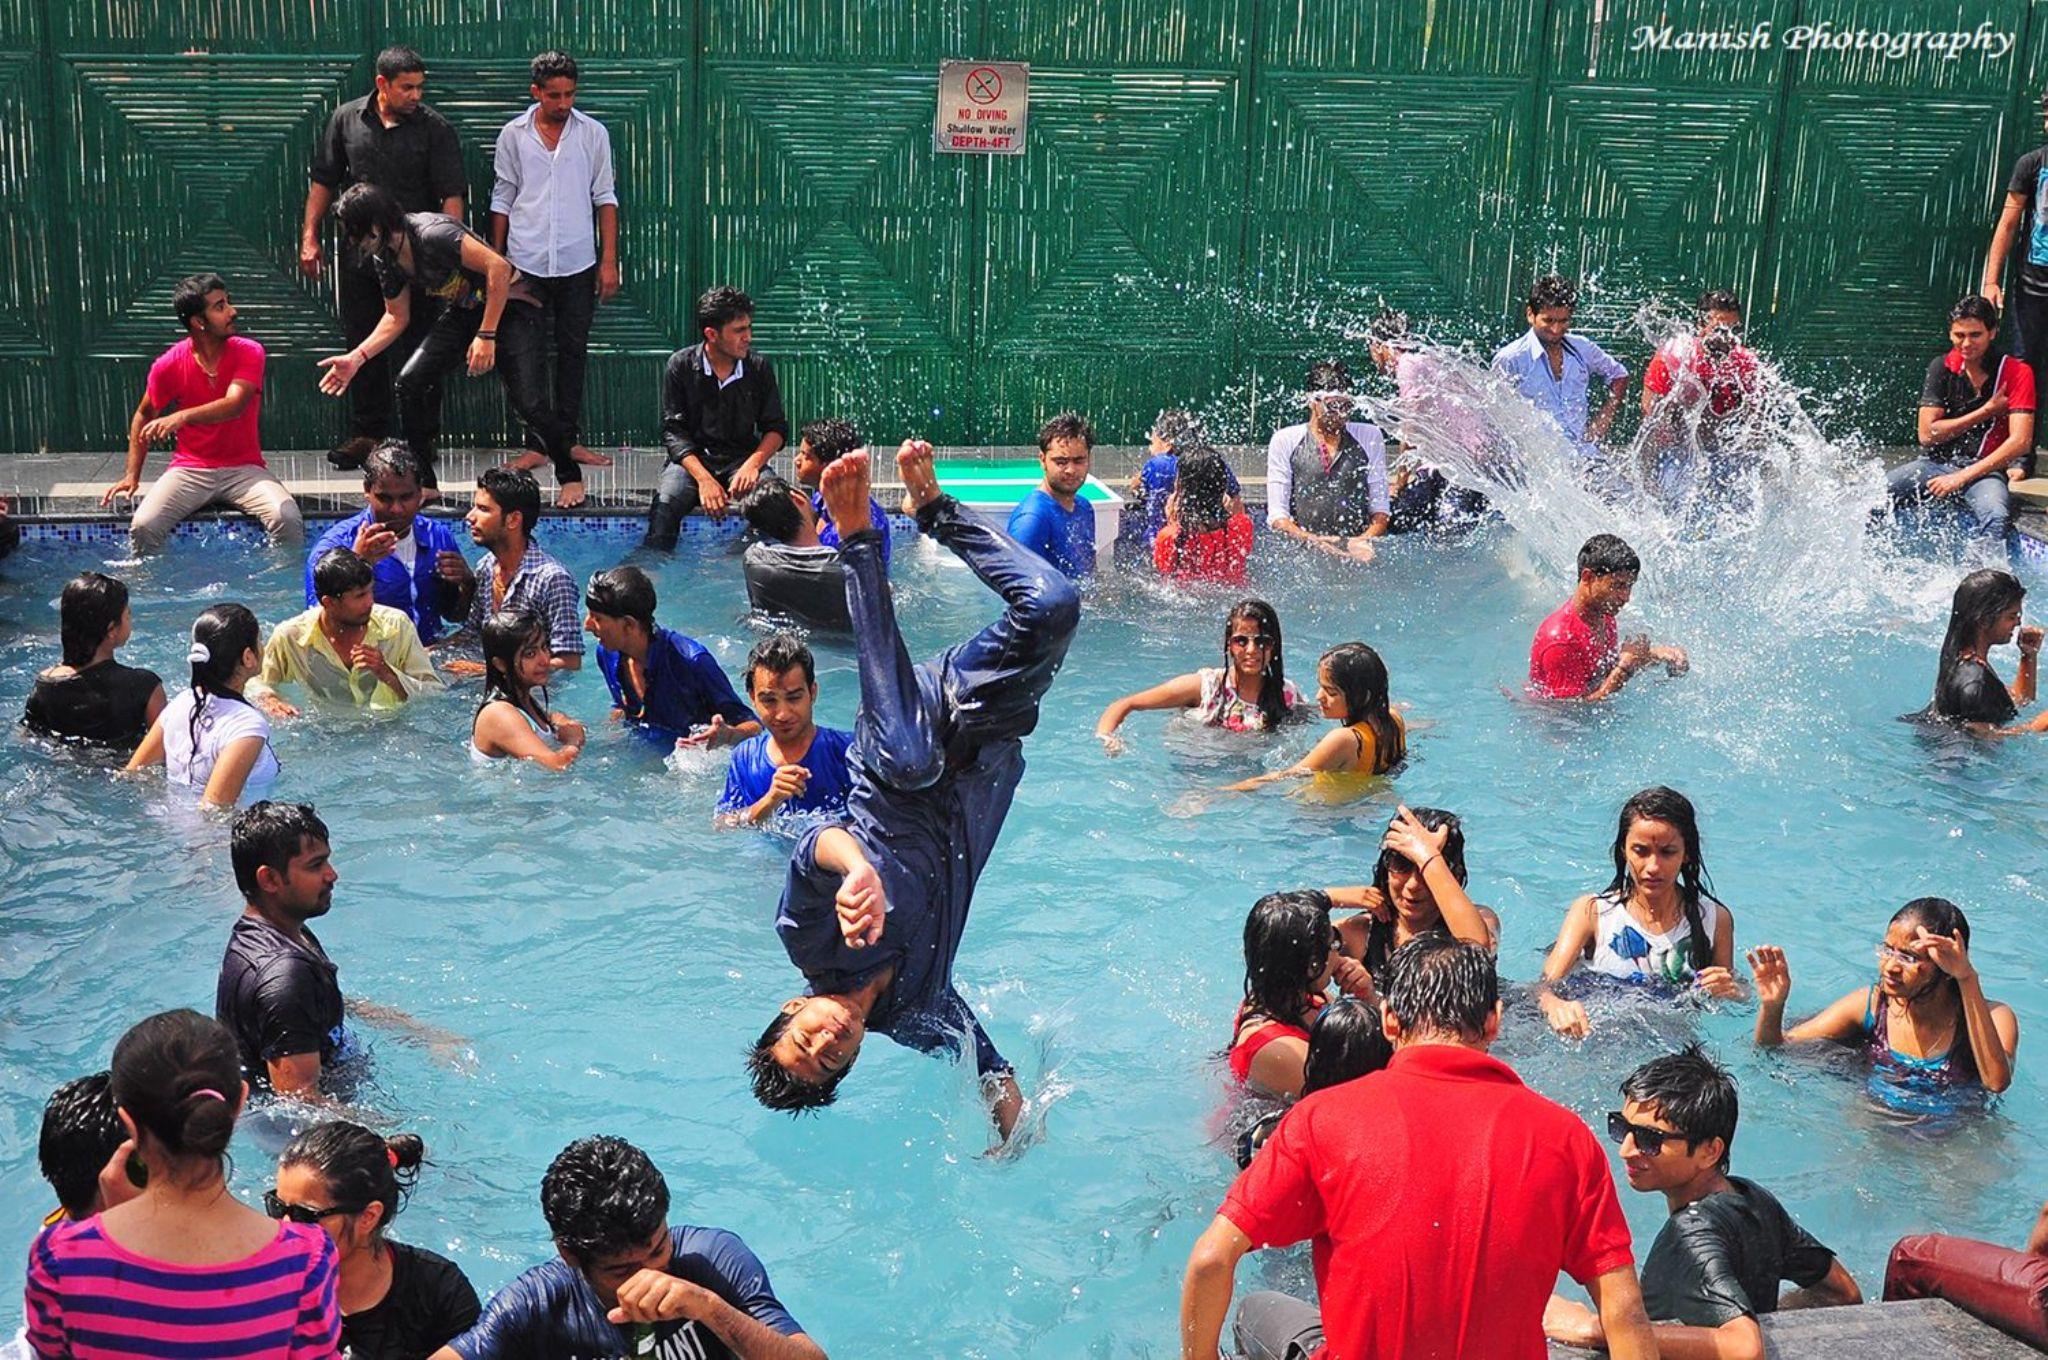 Jaipurites Enjoying the || Rain Dance+Pool Party || 21-06-14 jaipur On D Occasion Of World Music Day by Maneesh Sharma